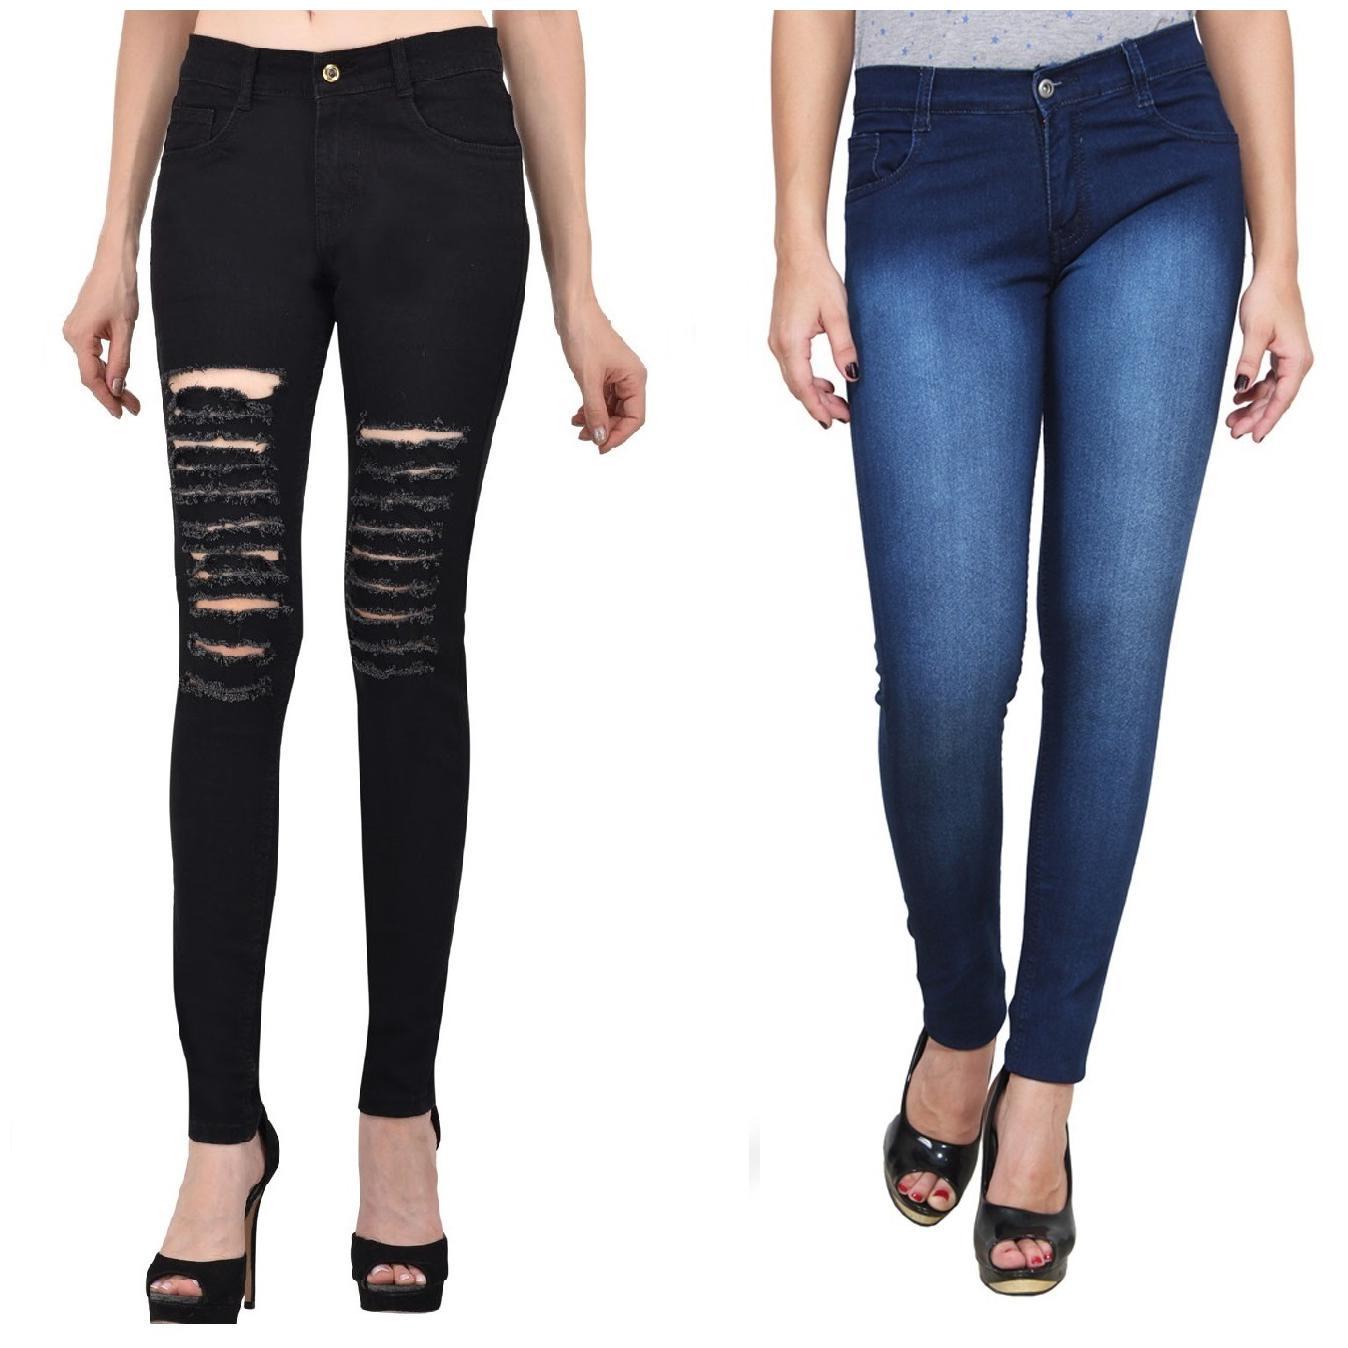 Ansh Fashion Wear Women's Denim Jeans - Regular Fit - Pack of 2 - T5BLK-DBM